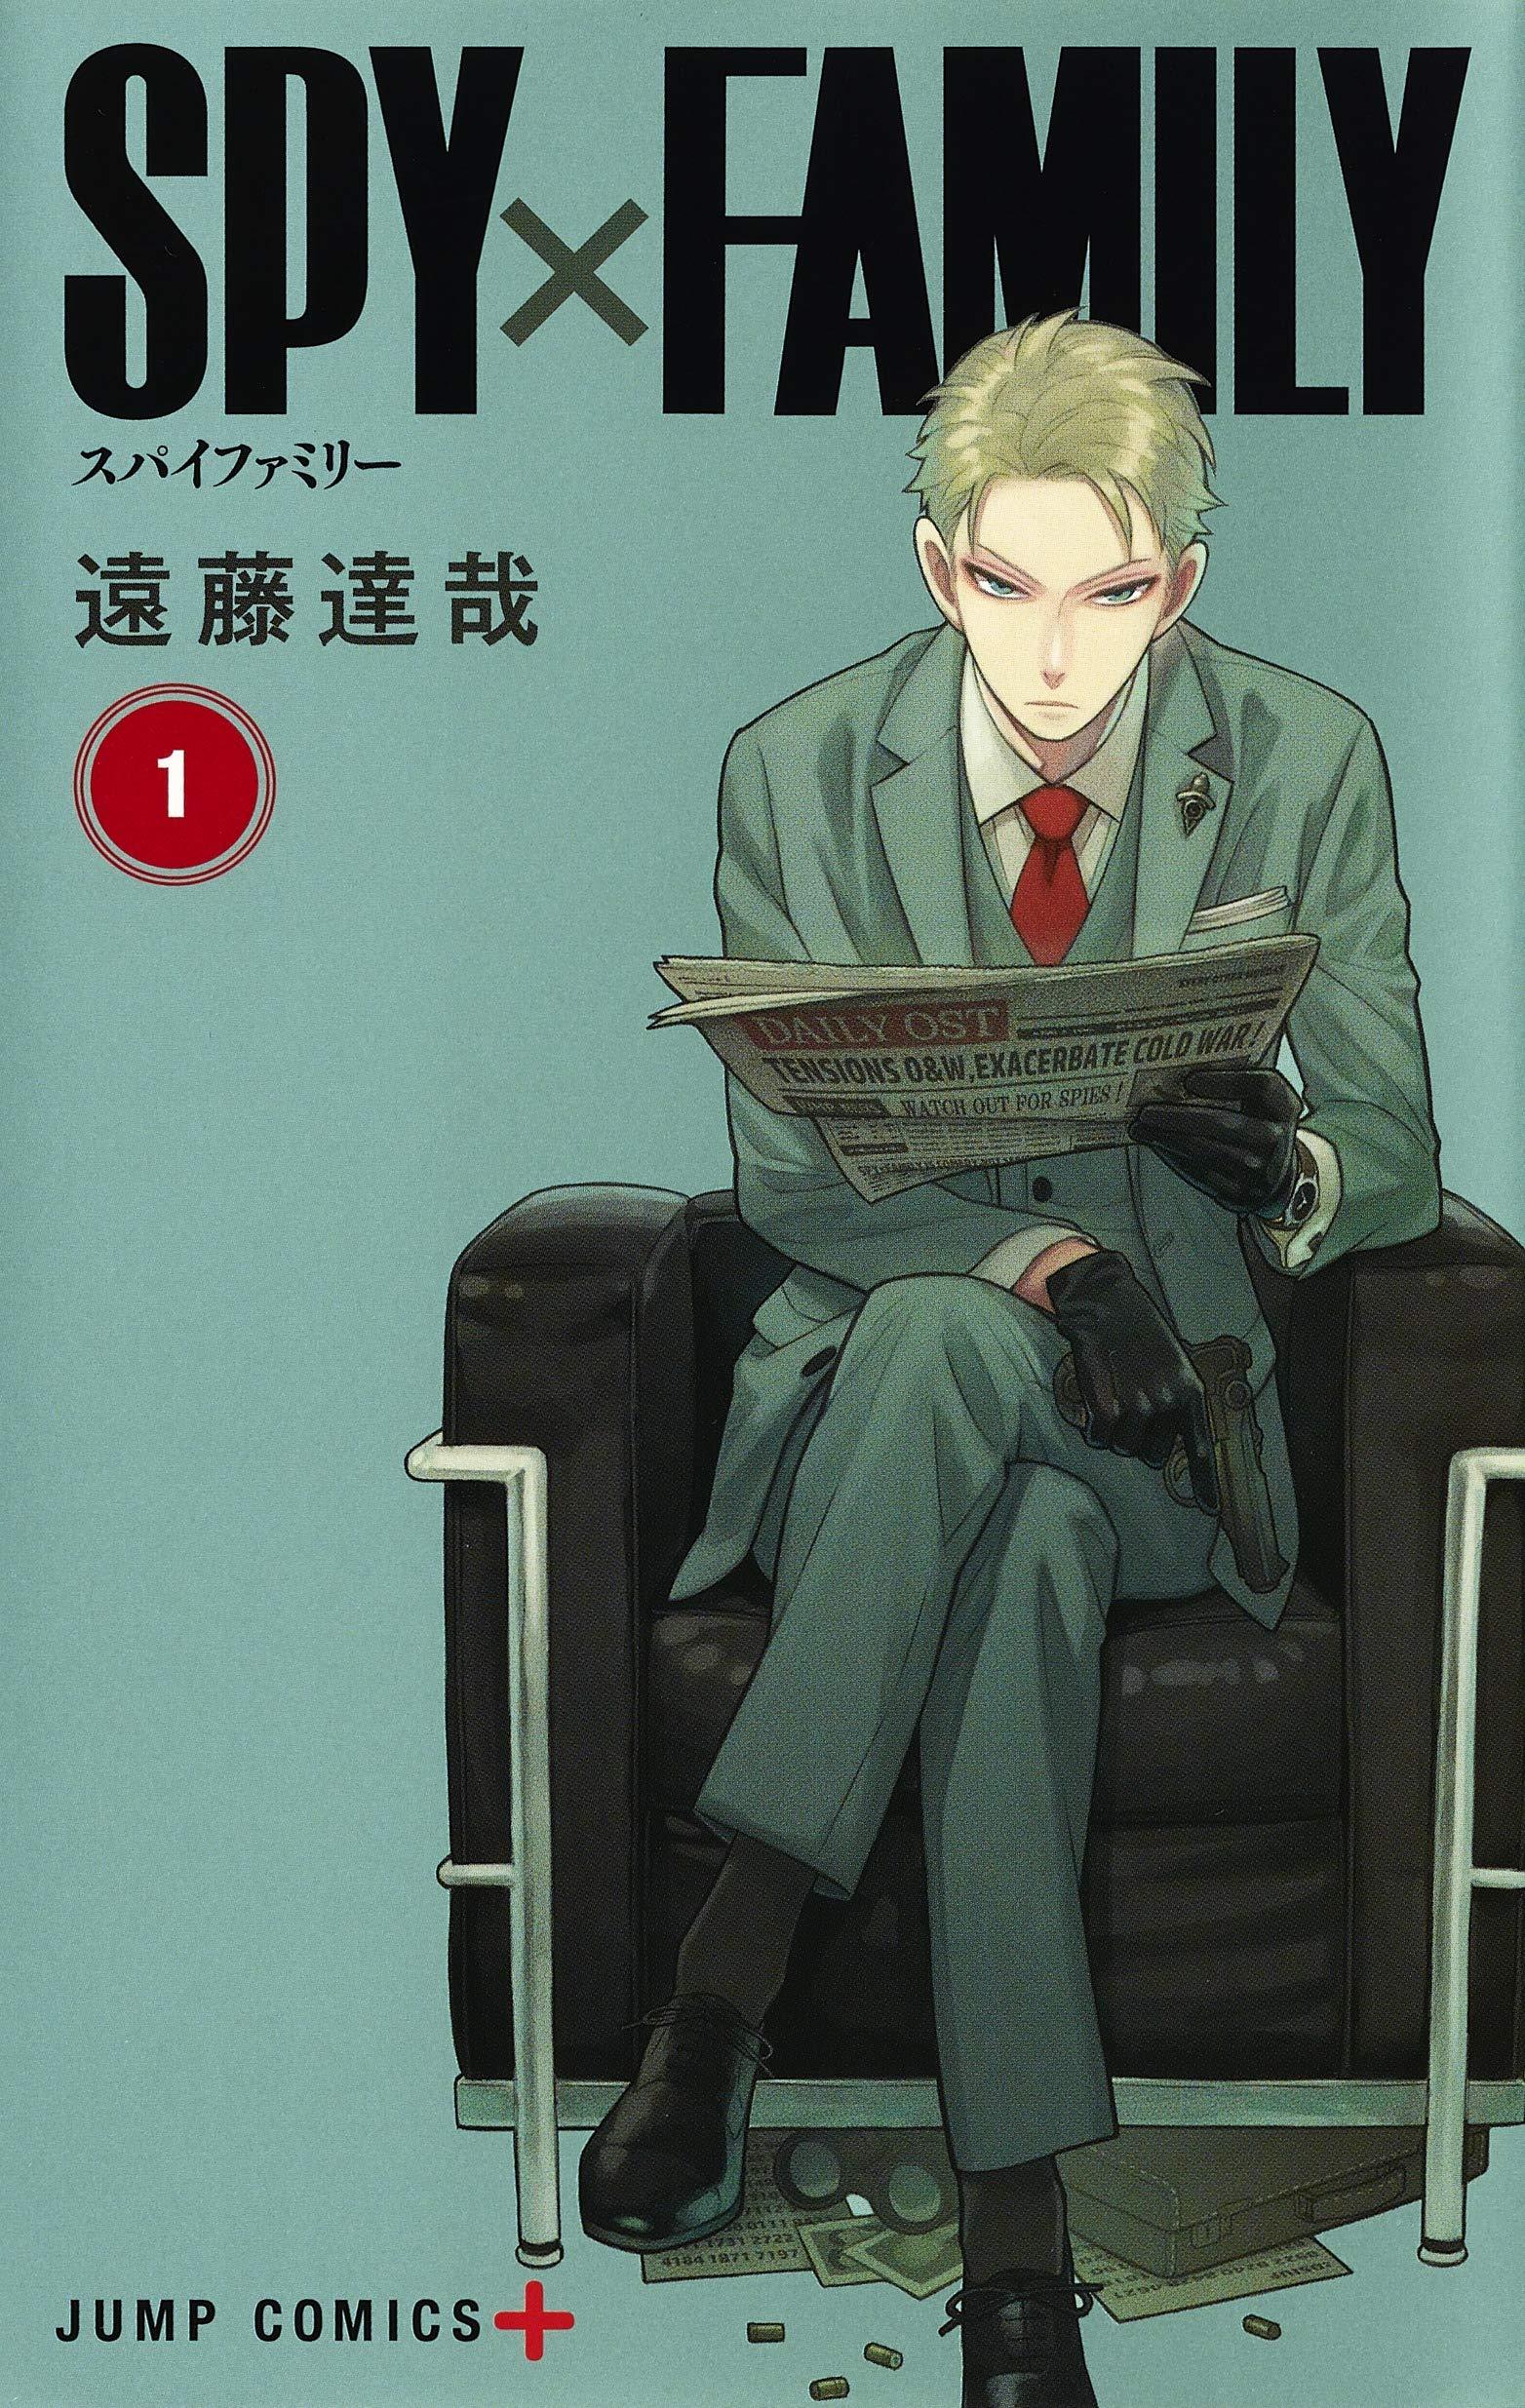 「マンガ大賞2021」第10位『SPY×FAMILY』遠藤達哉先生